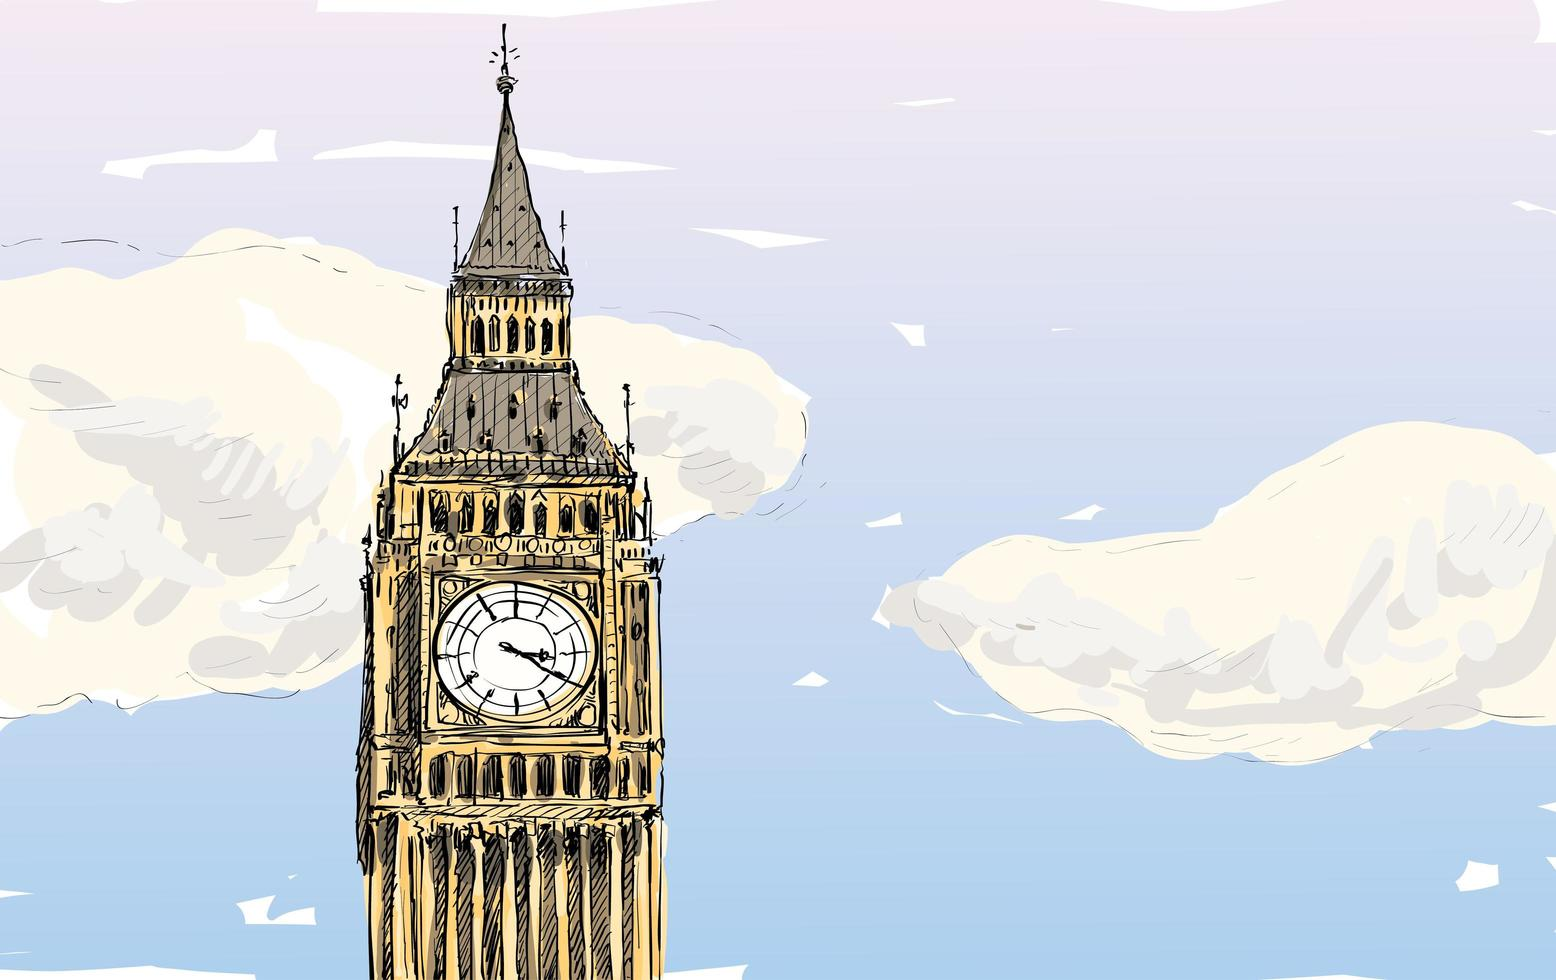 boceto a color del big ben, torre de londres vector